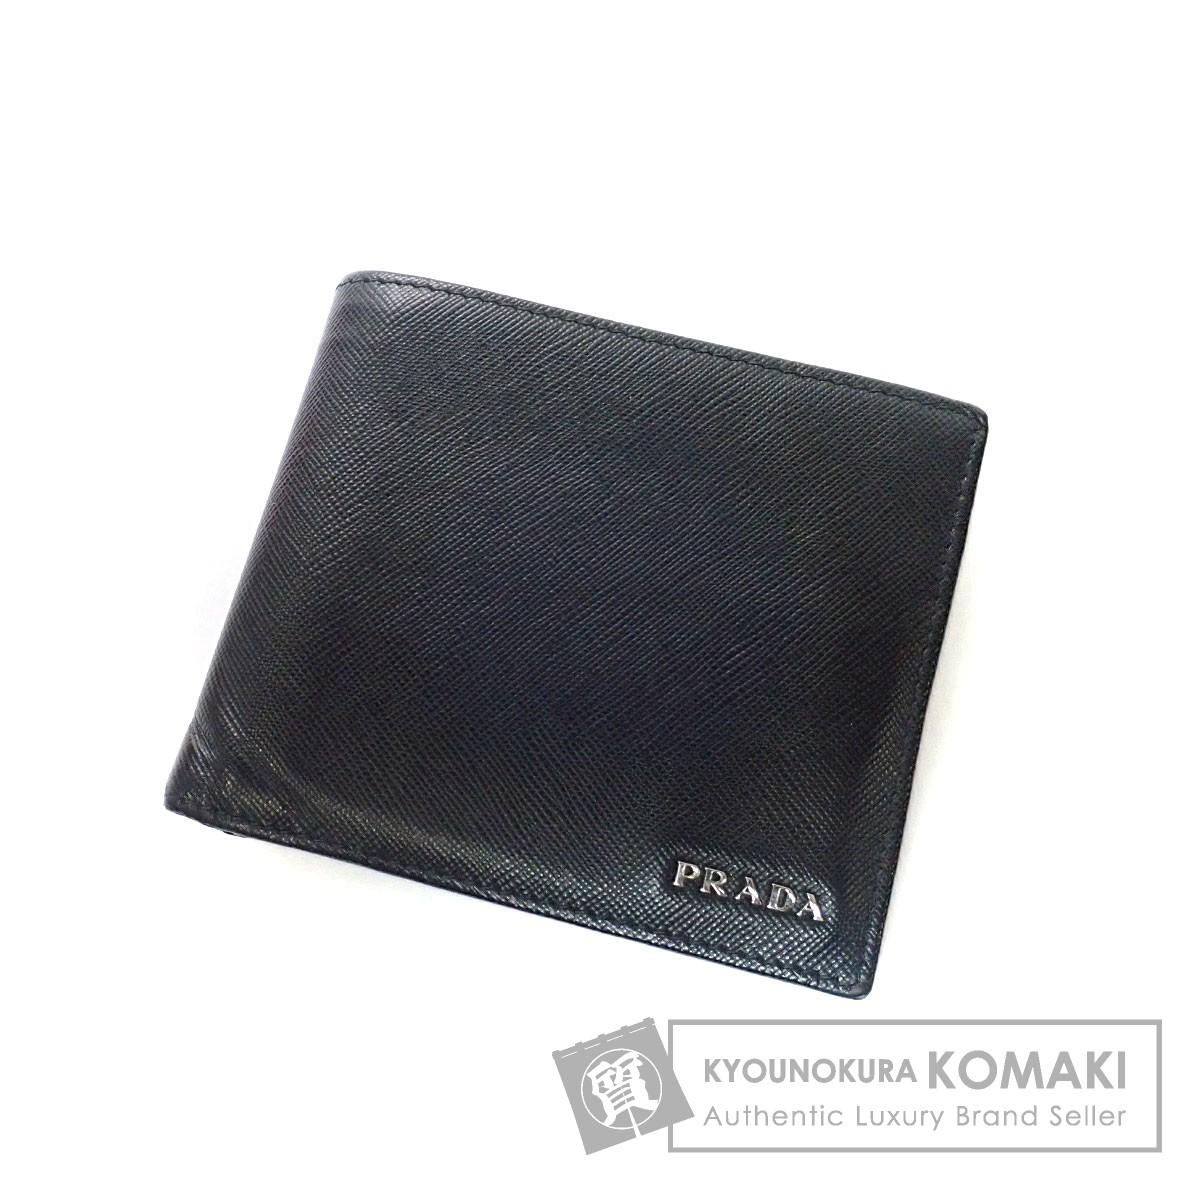 3b1fe7aed0ea PRADA 2M0738 二つ折り財布(小銭入れあり) レザー メンズ 【中古】【プラダ】 最新の激安